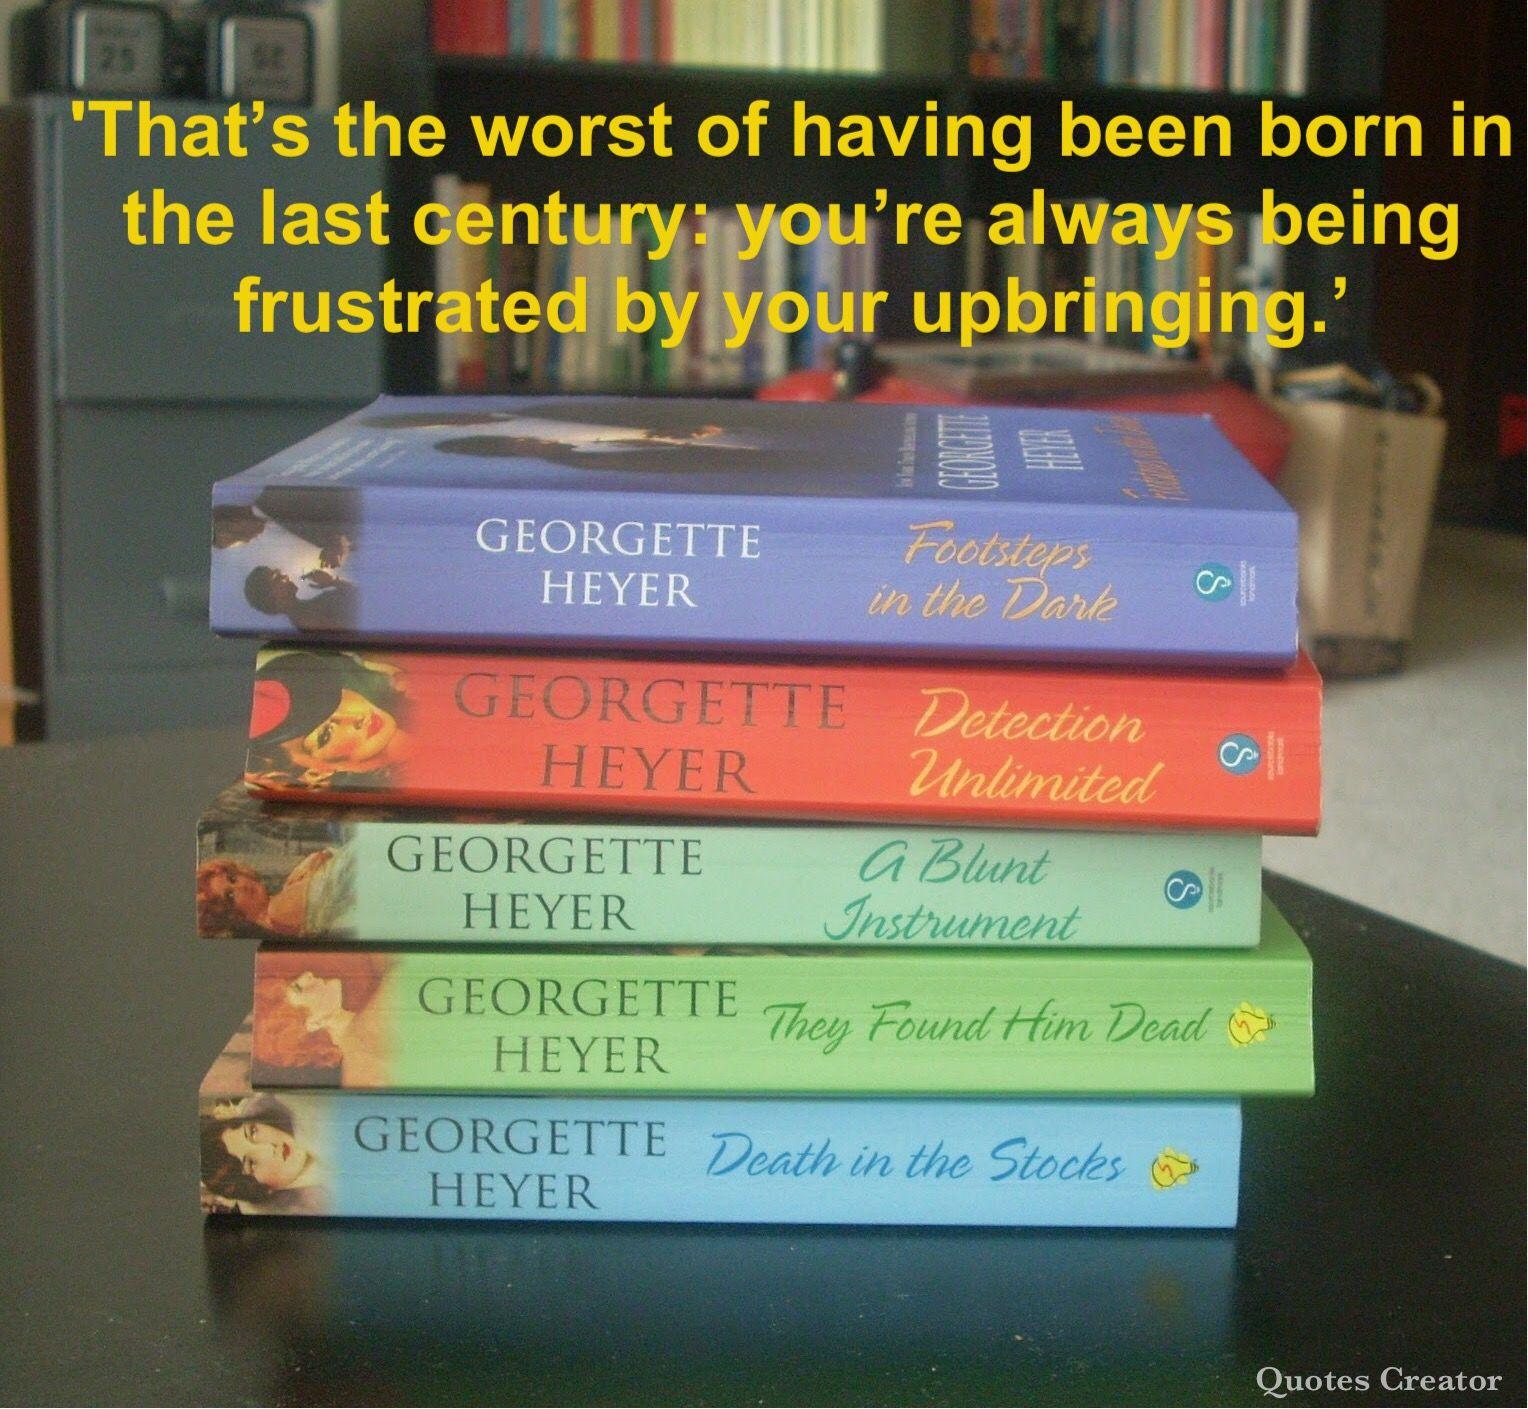 244. Georgette Heyer  Detective quote